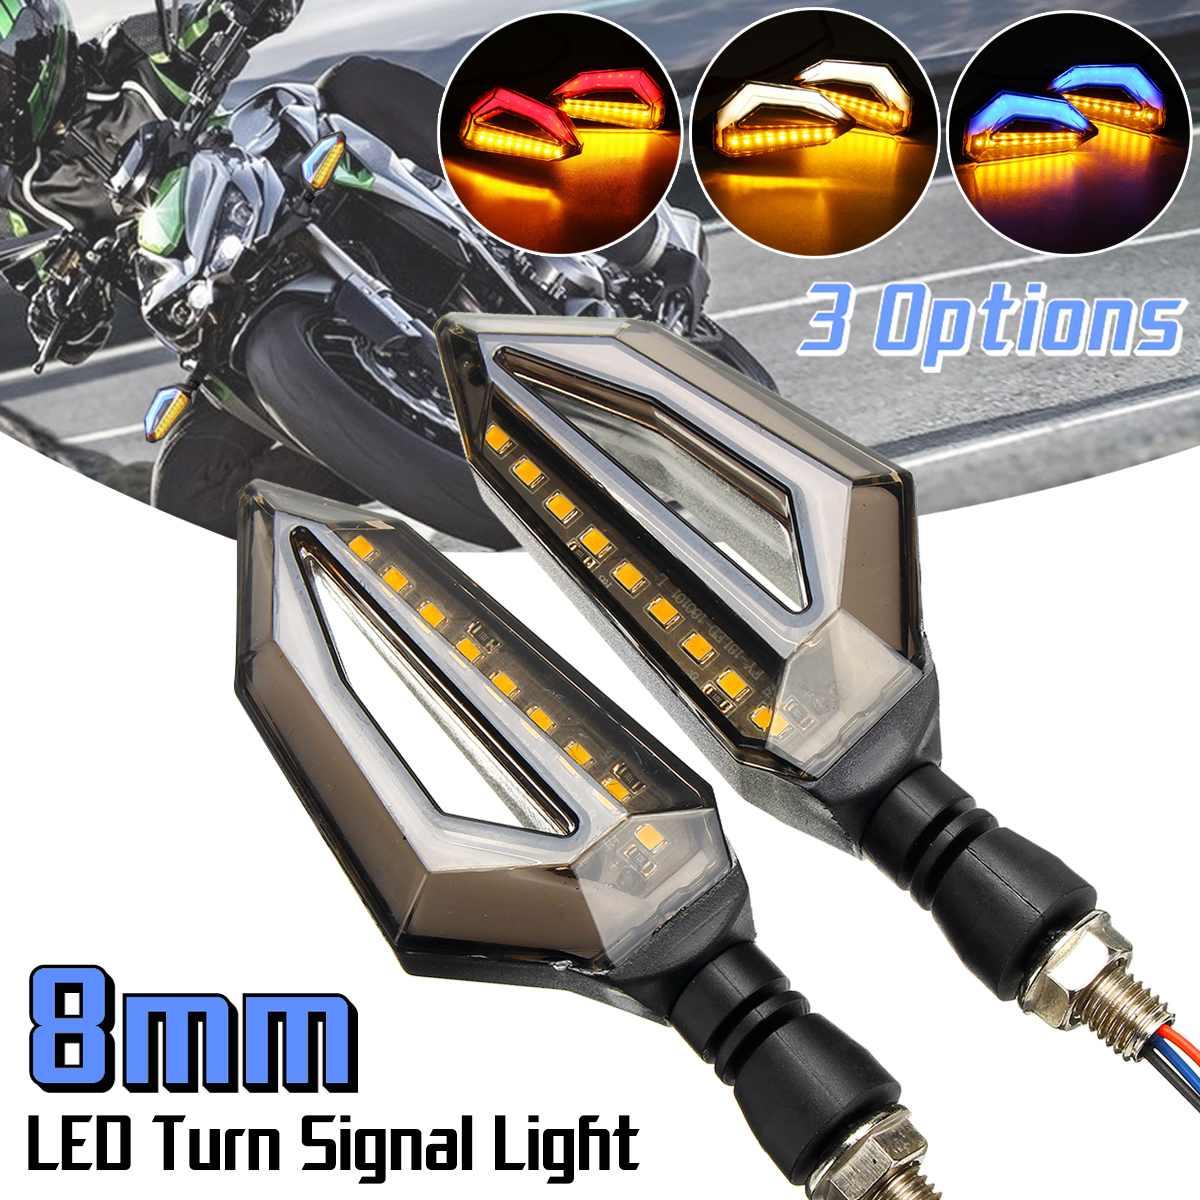 2pcs 12V Motorcycle LED Turn Signal Indicator Lights For Kawasaki/Yamaha/BMW/Honda/KTM2pcs 12V Motorcycle LED Turn Signal Indicator Lights For Kawasaki/Yamaha/BMW/Honda/KTM